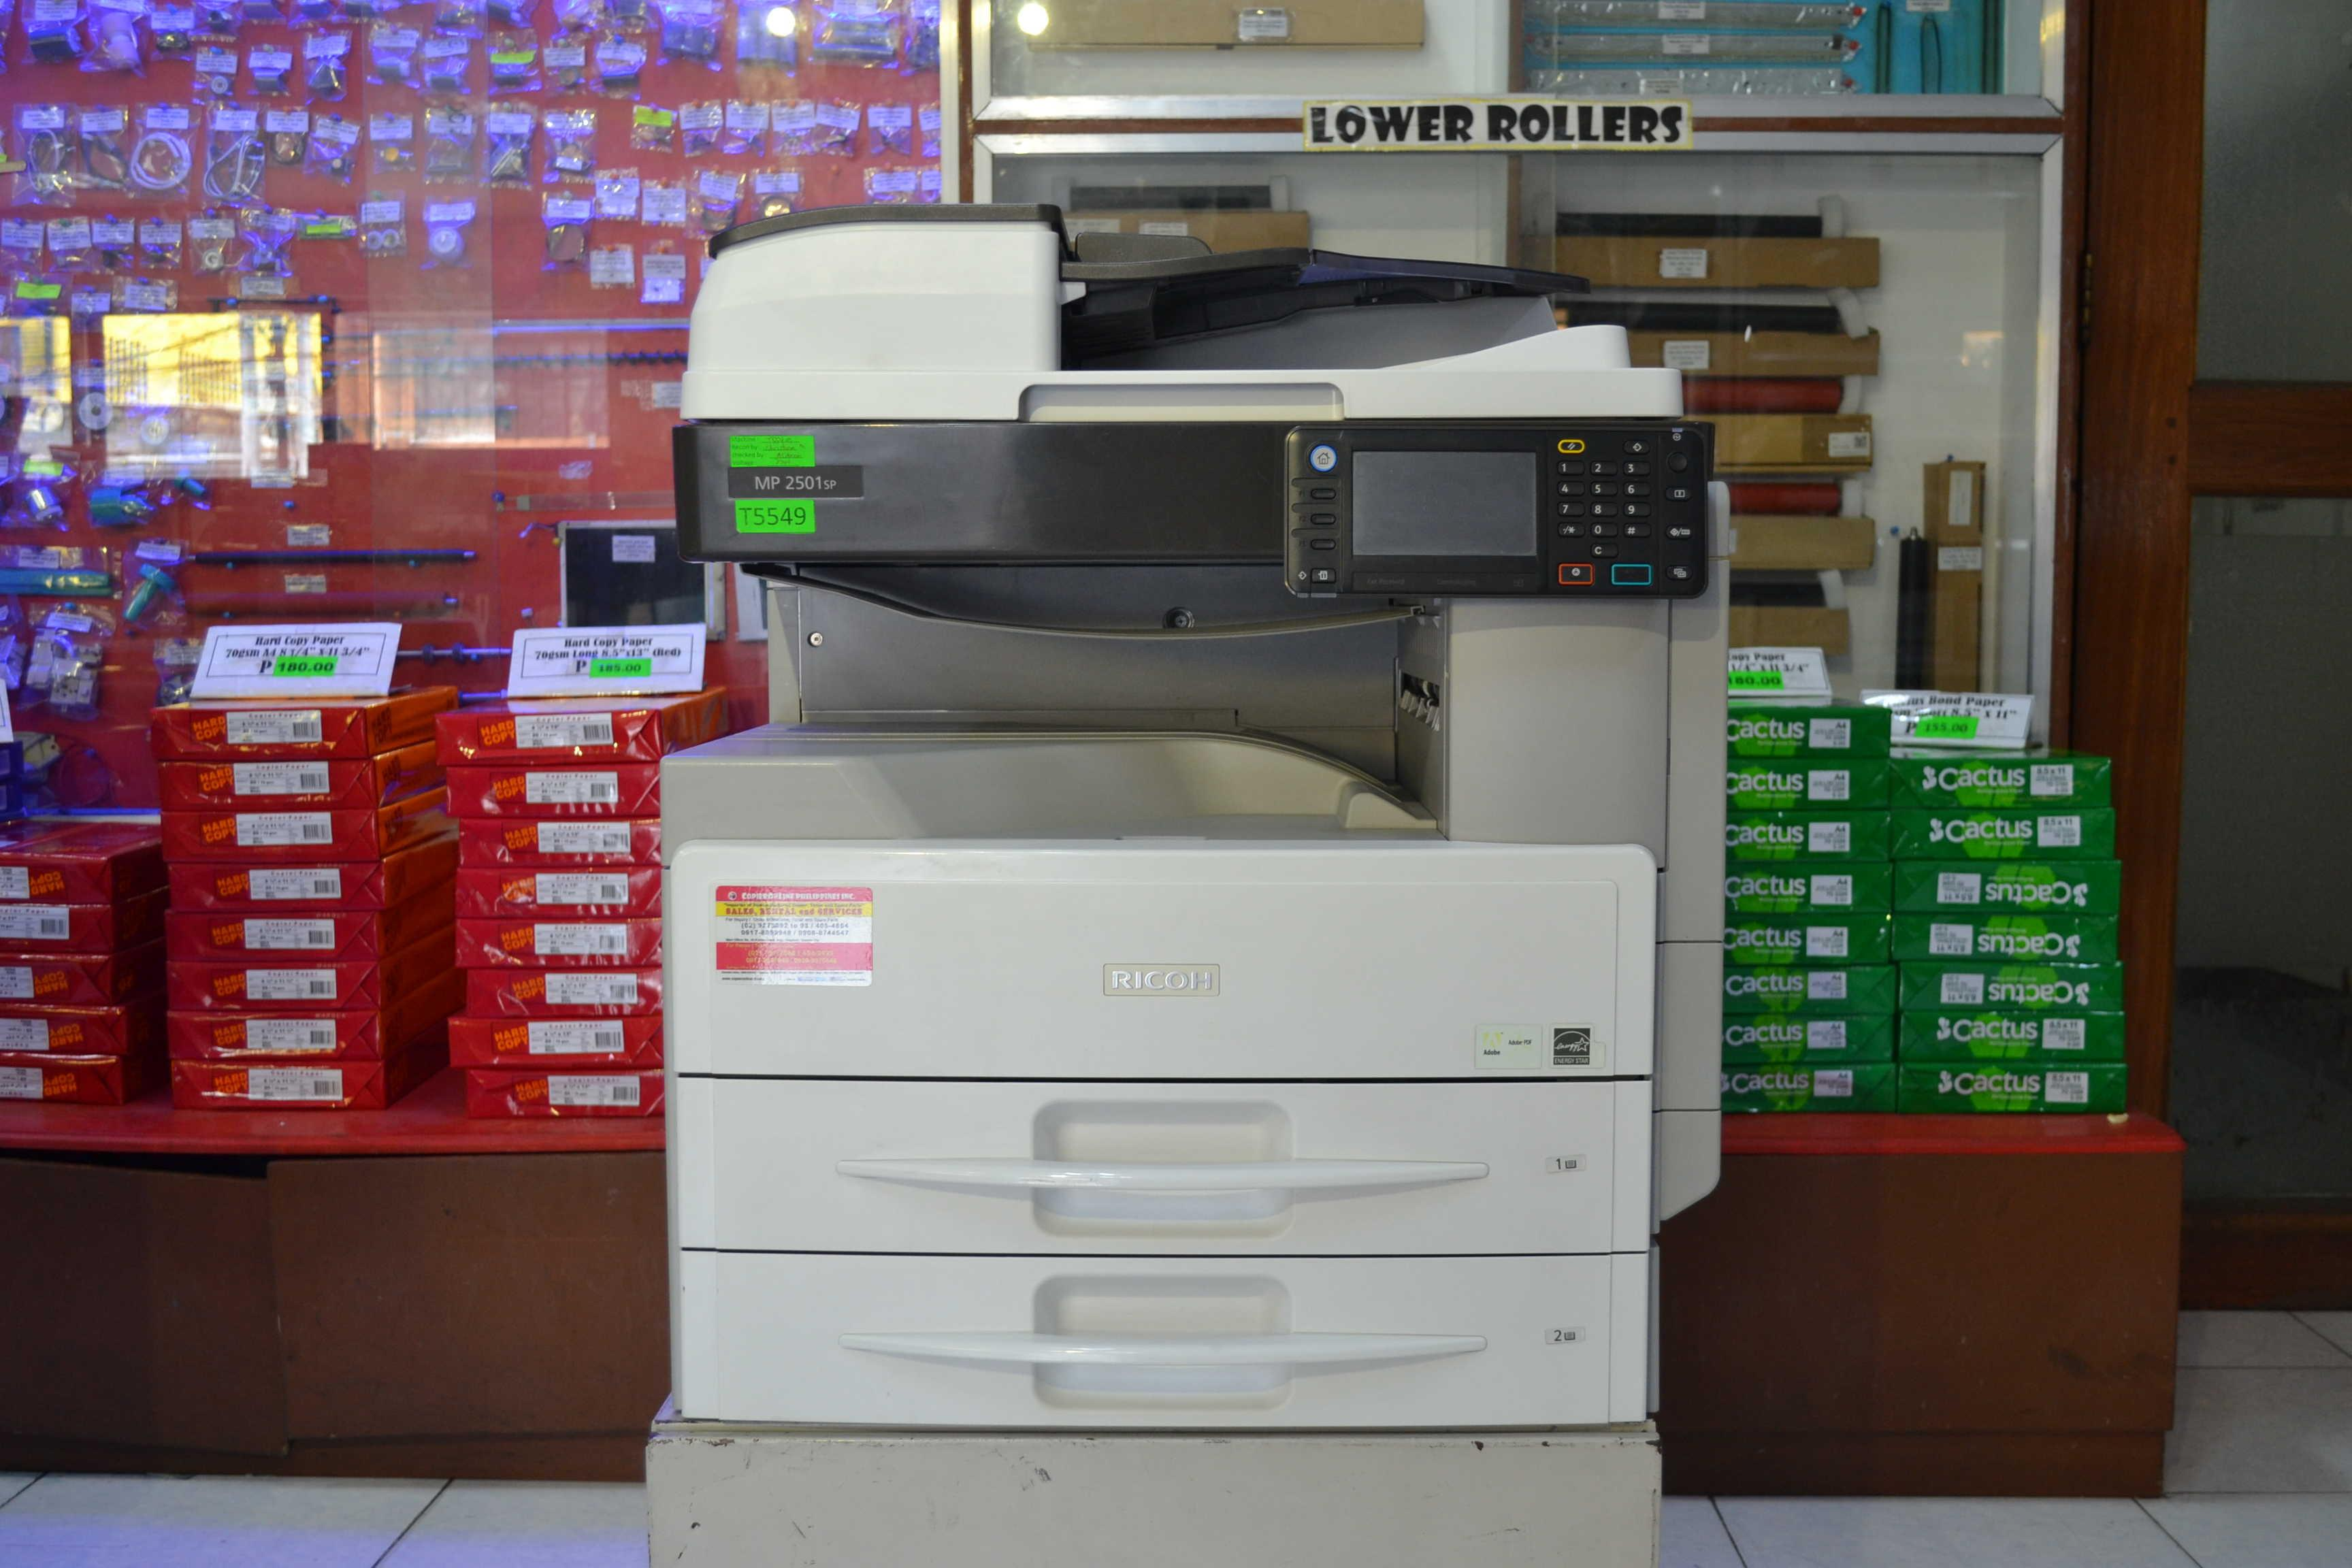 XEROX COPIER MACHINE Ricoh Aficio MP2501sp (Copier, Printer, Scanner, & Fax)